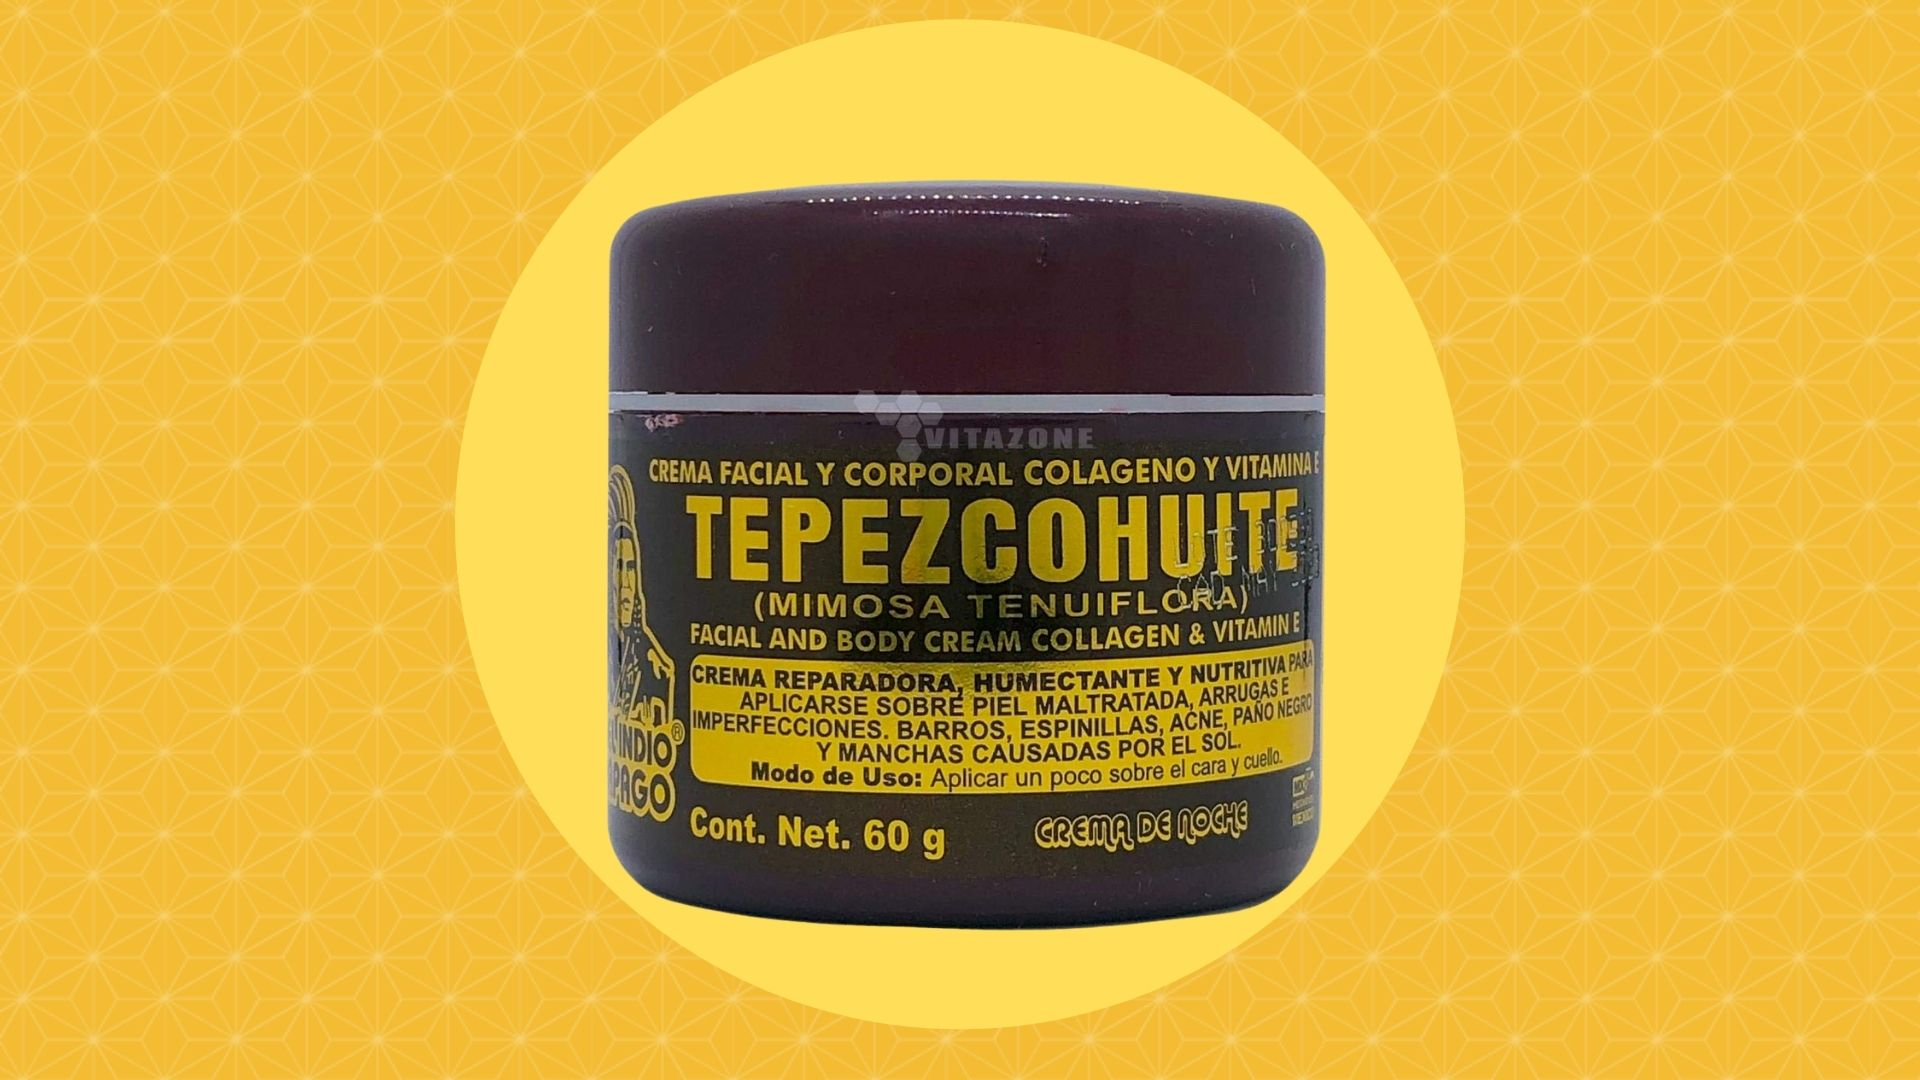 Indio Papago Crema de Tepezcohuite